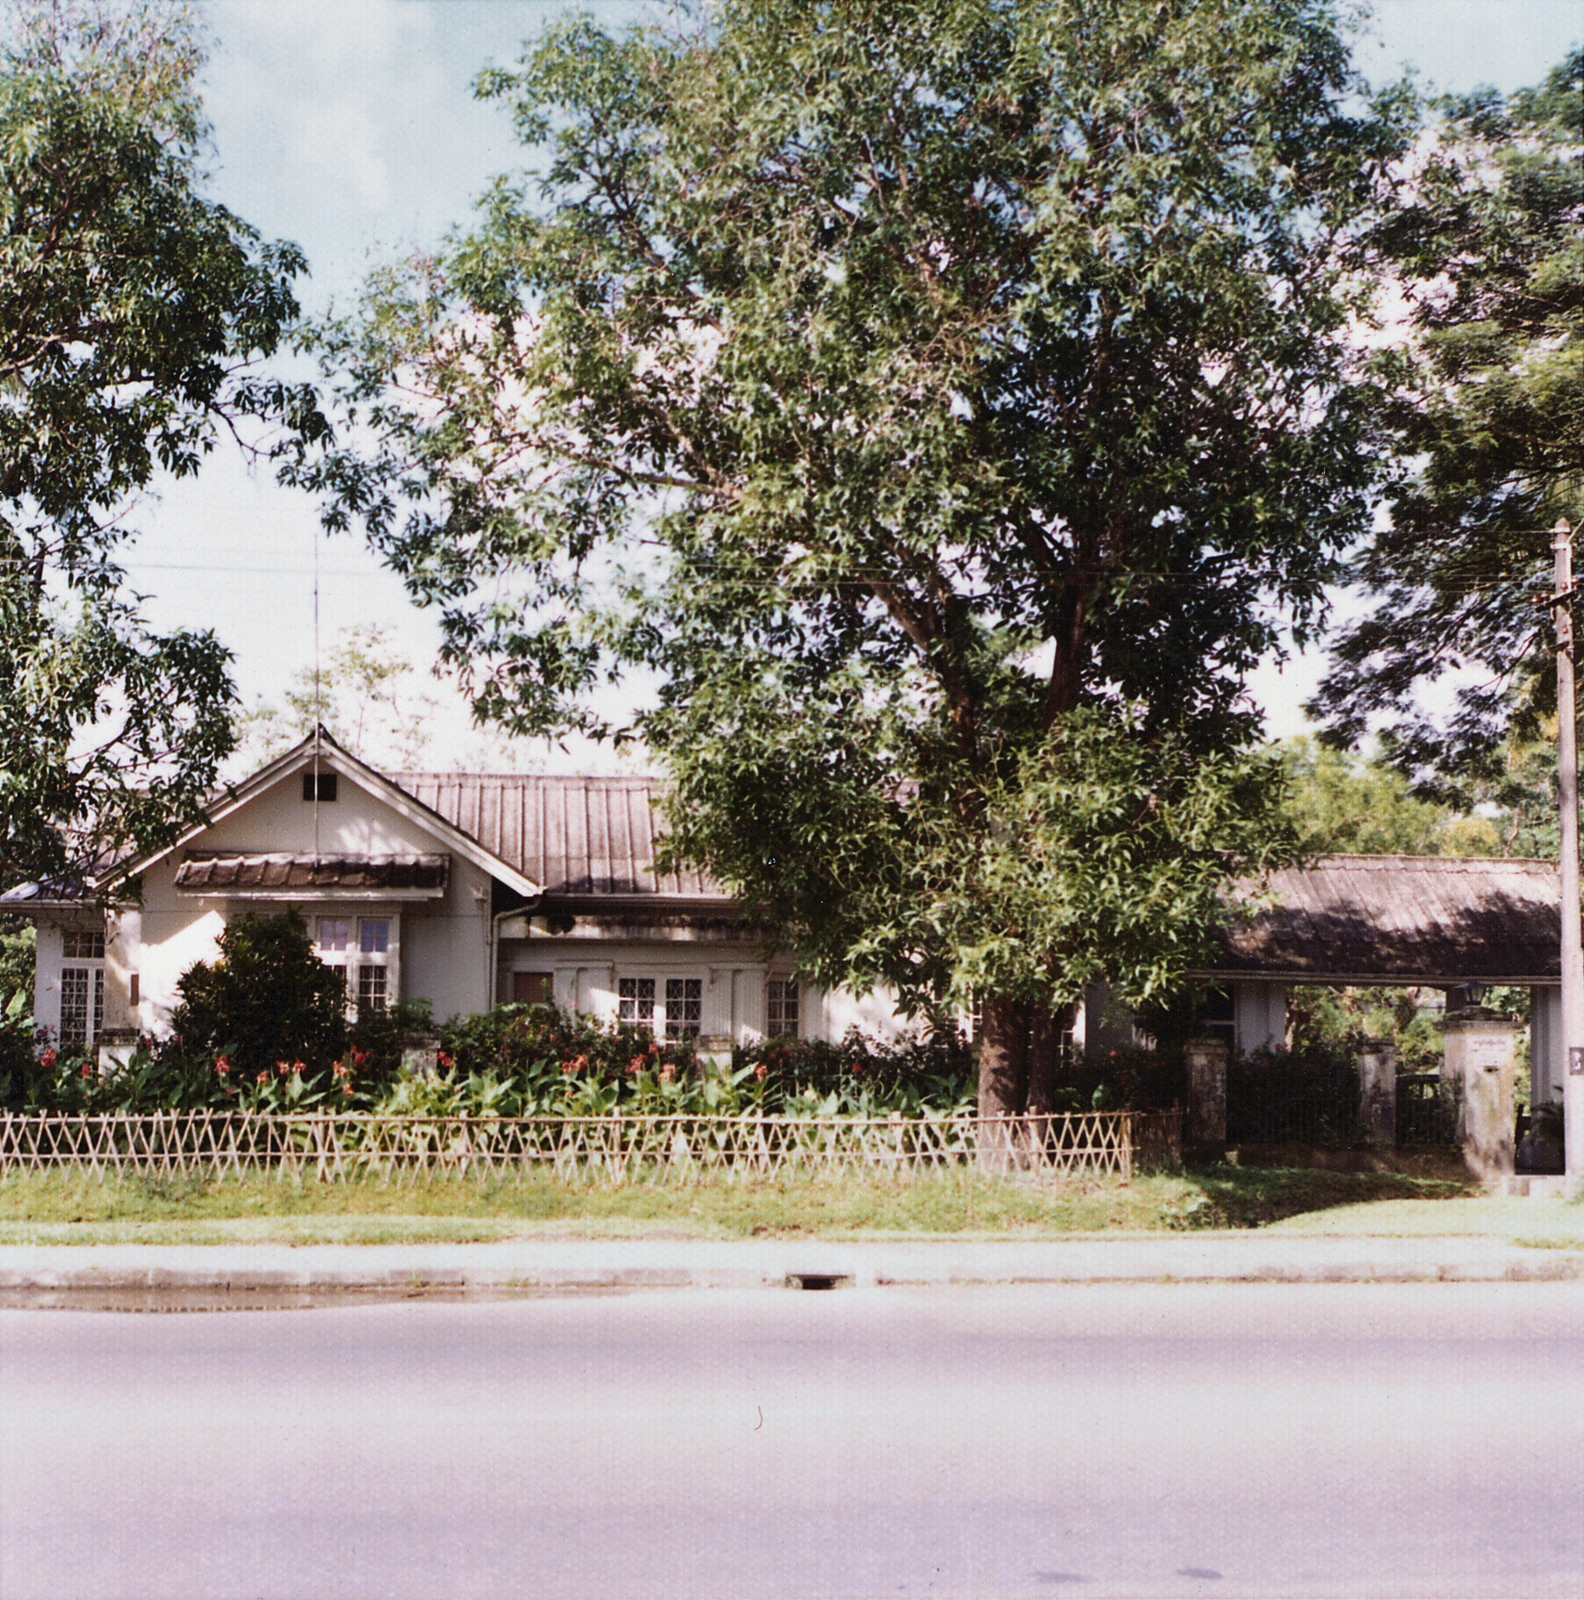 Rangoon - Standard Level Position Residence - 1975